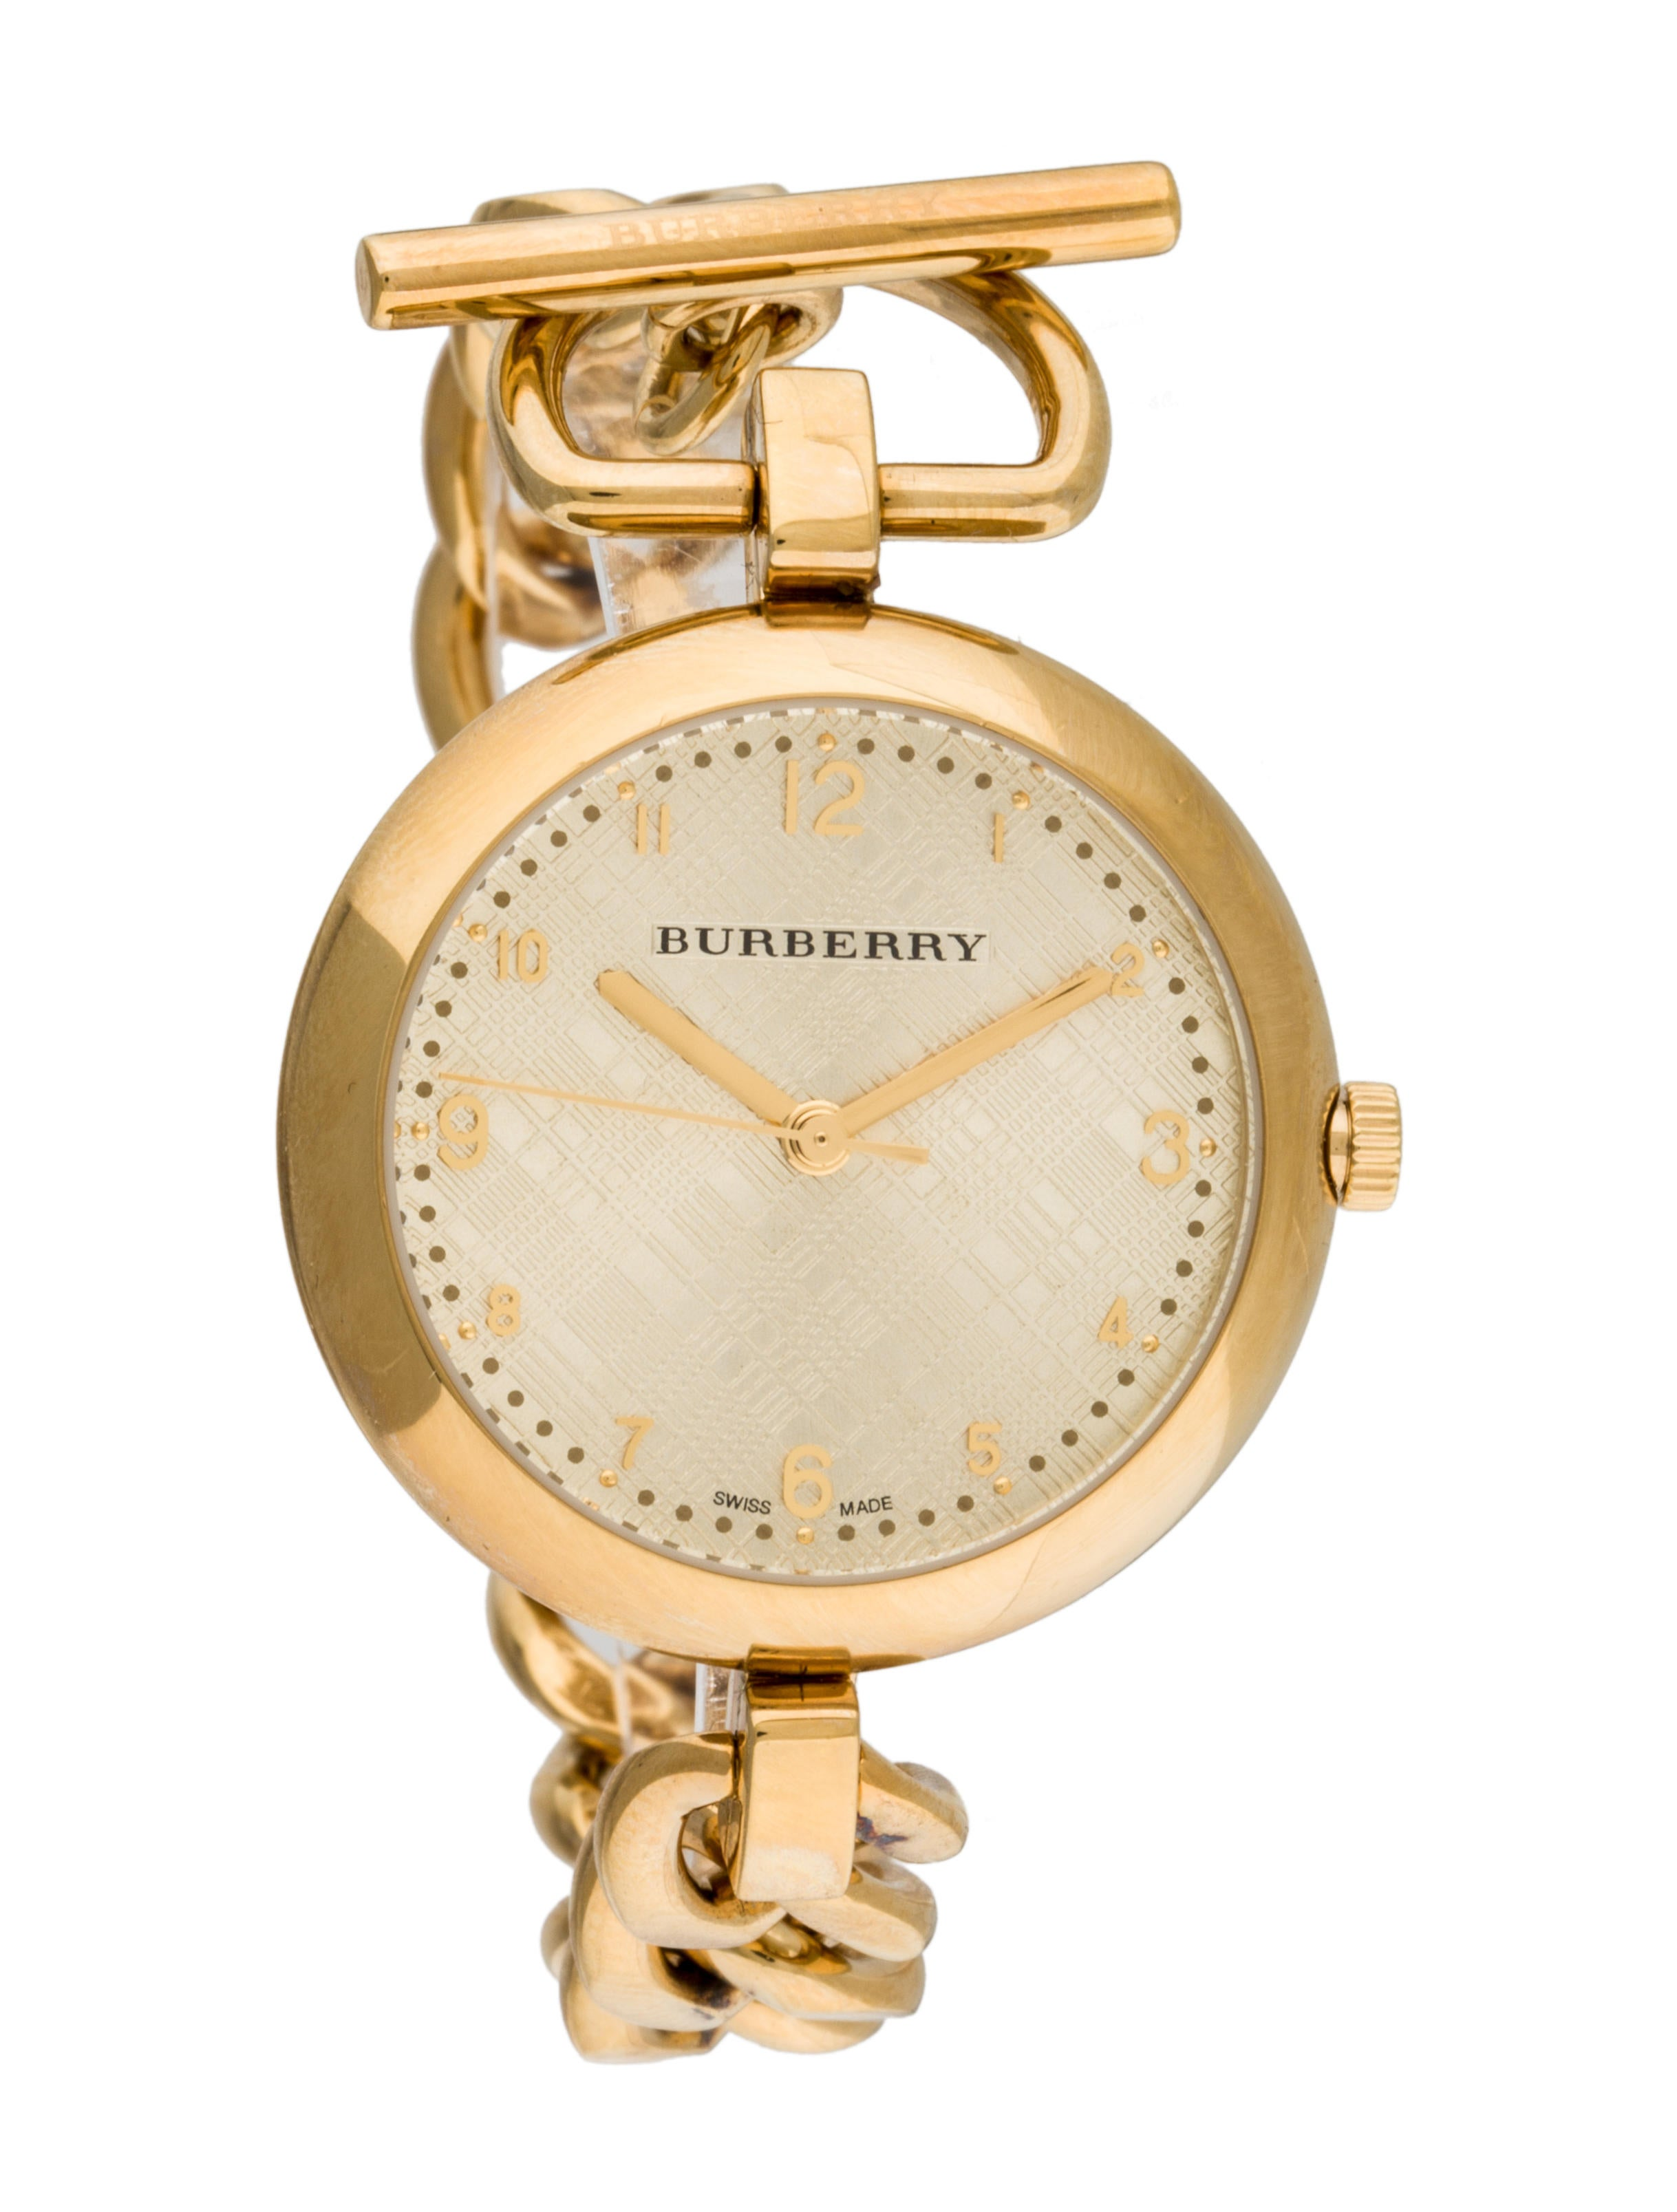 burberry chain watch